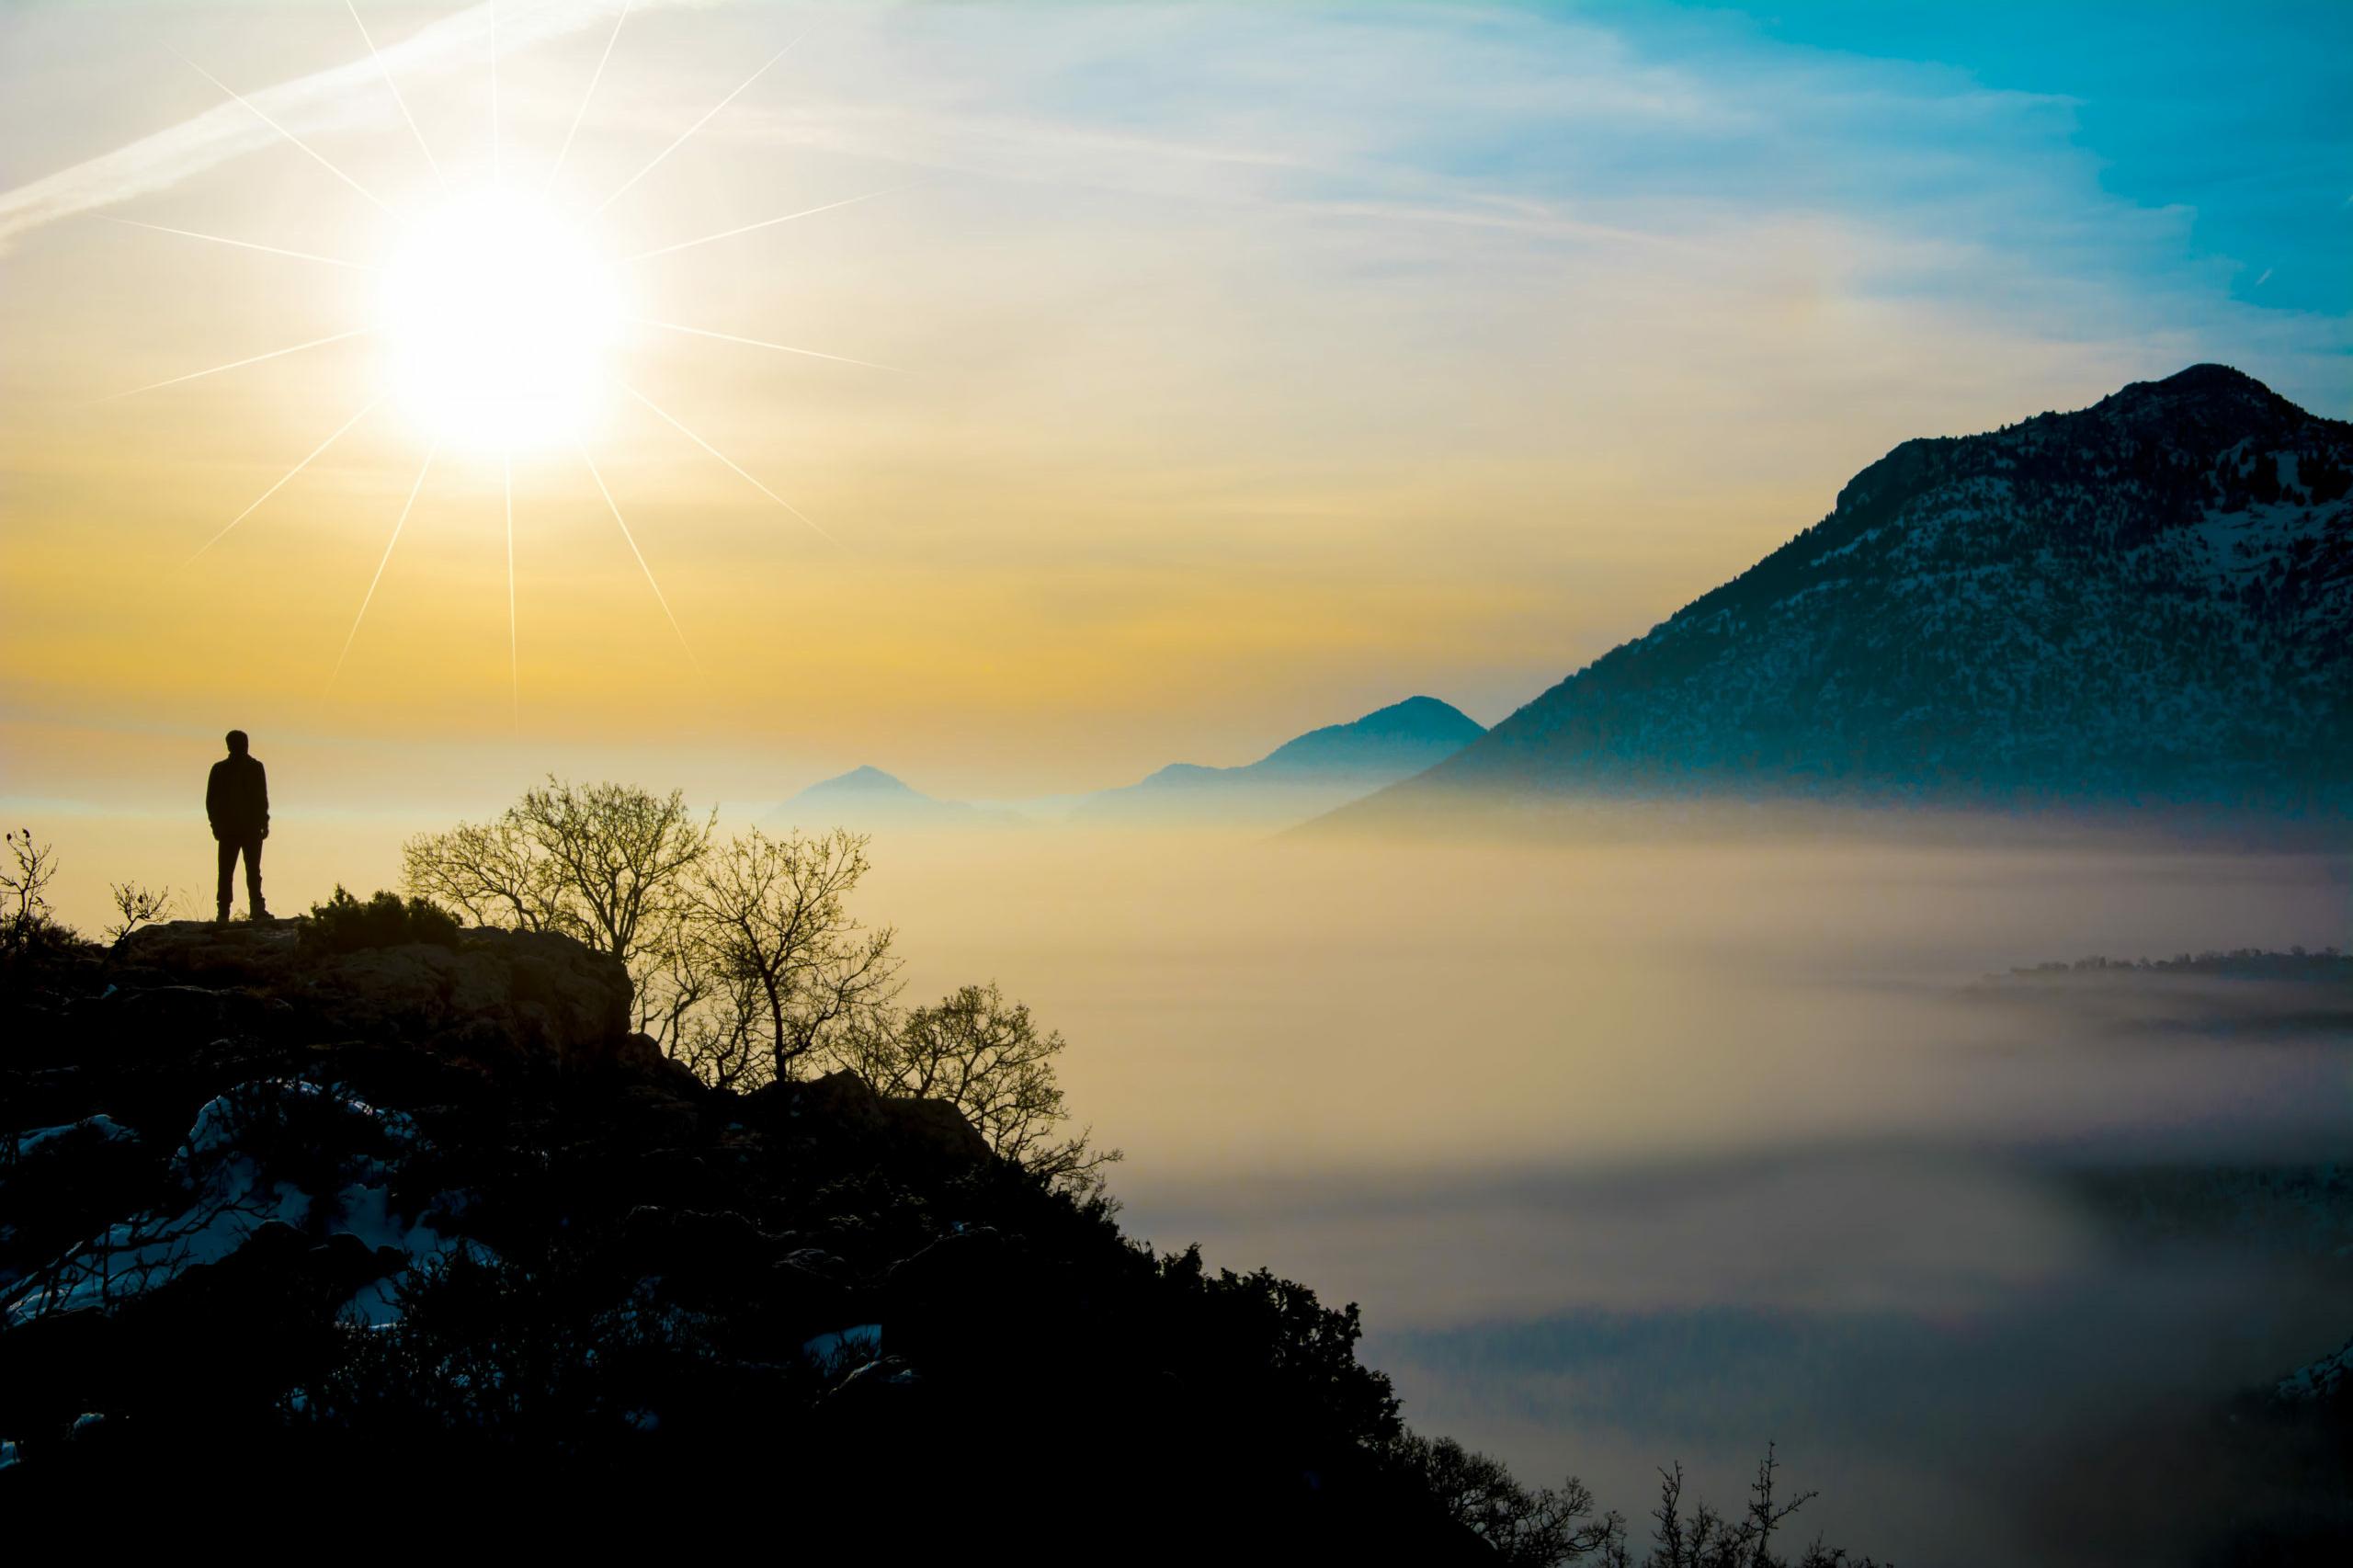 Mann betrachtet einen Sonnenuntergang in den Bergen